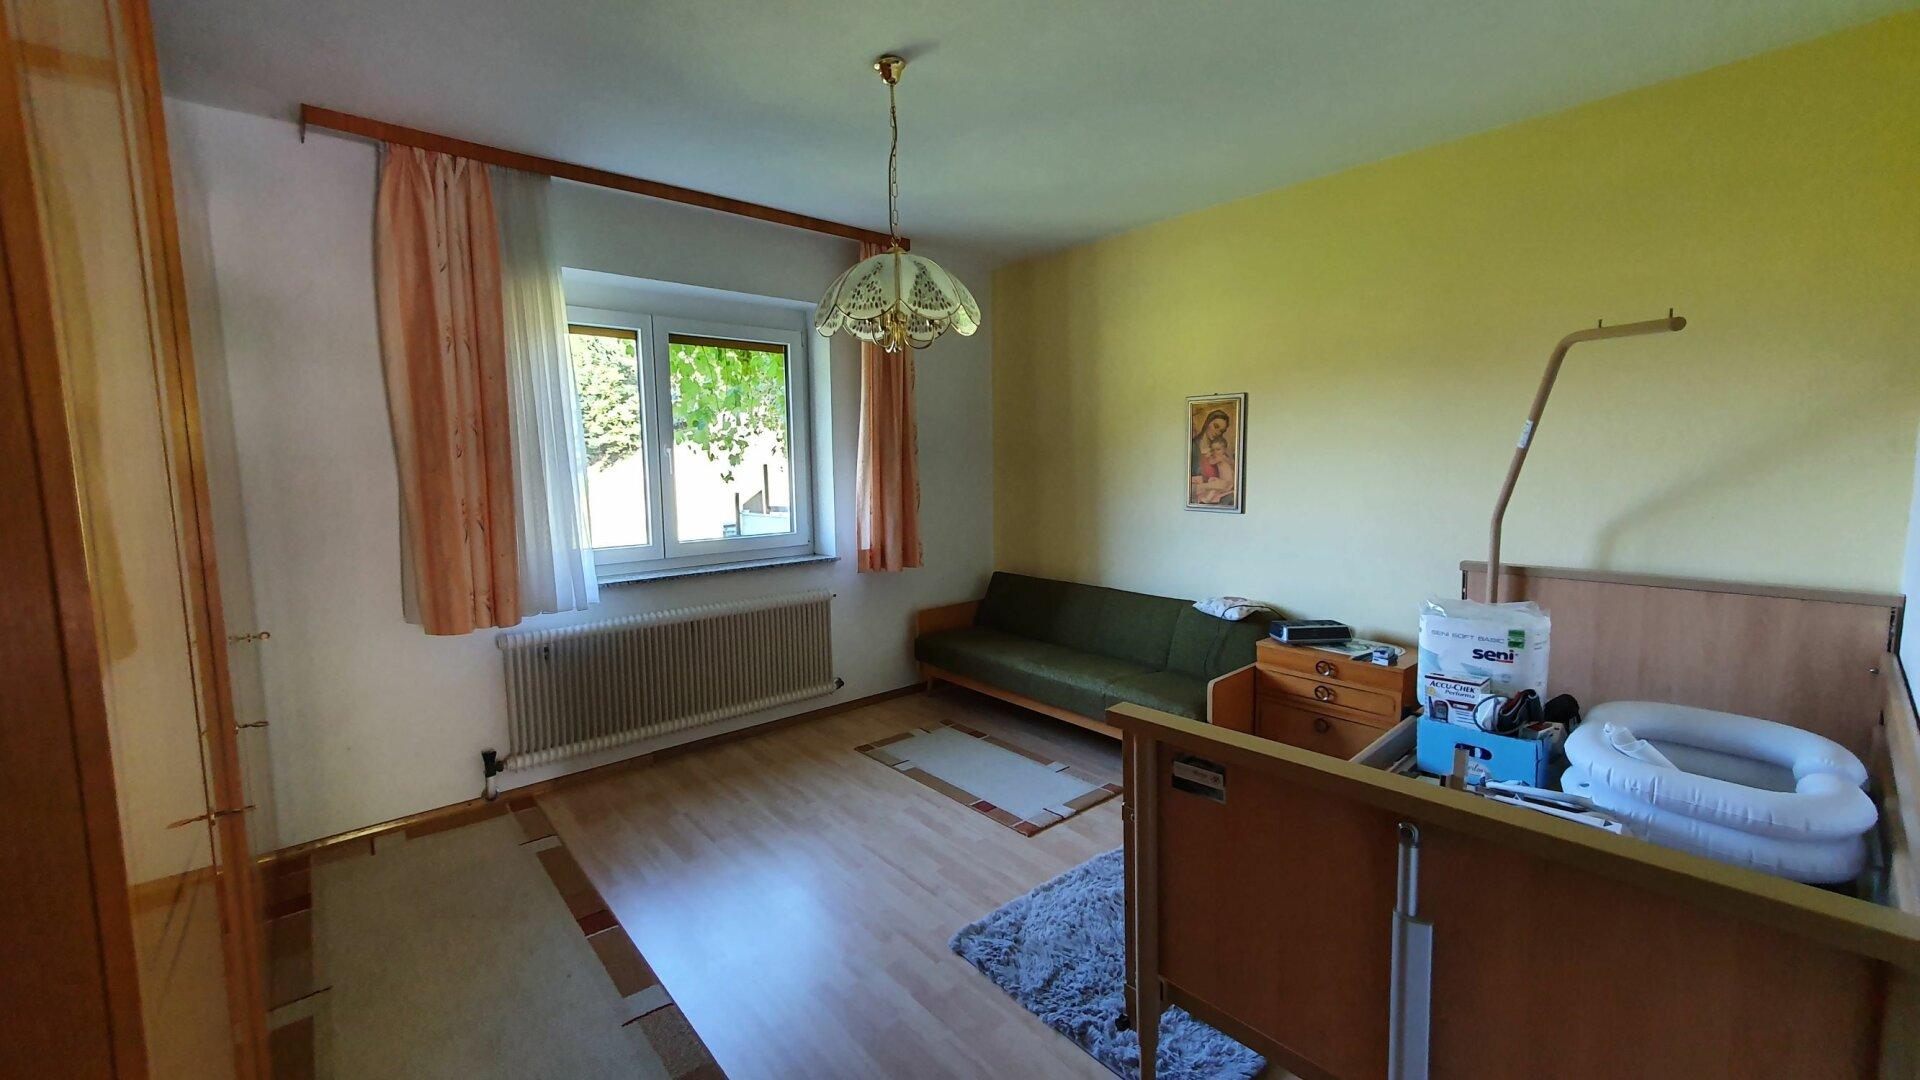 Einfamilienhaus Kirchbichl, Zimmer EG